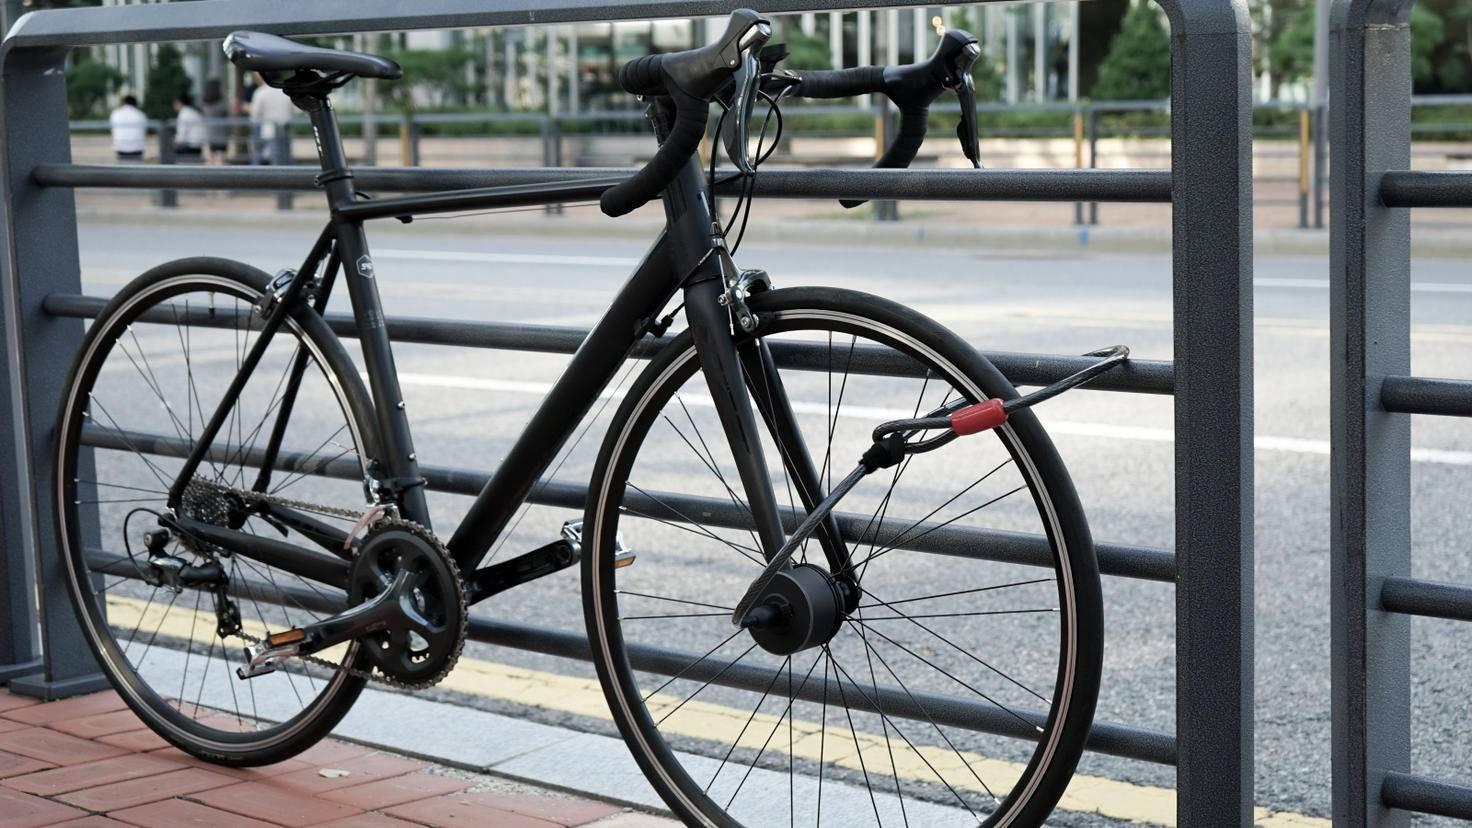 bisecu smartes Fahrradschloss